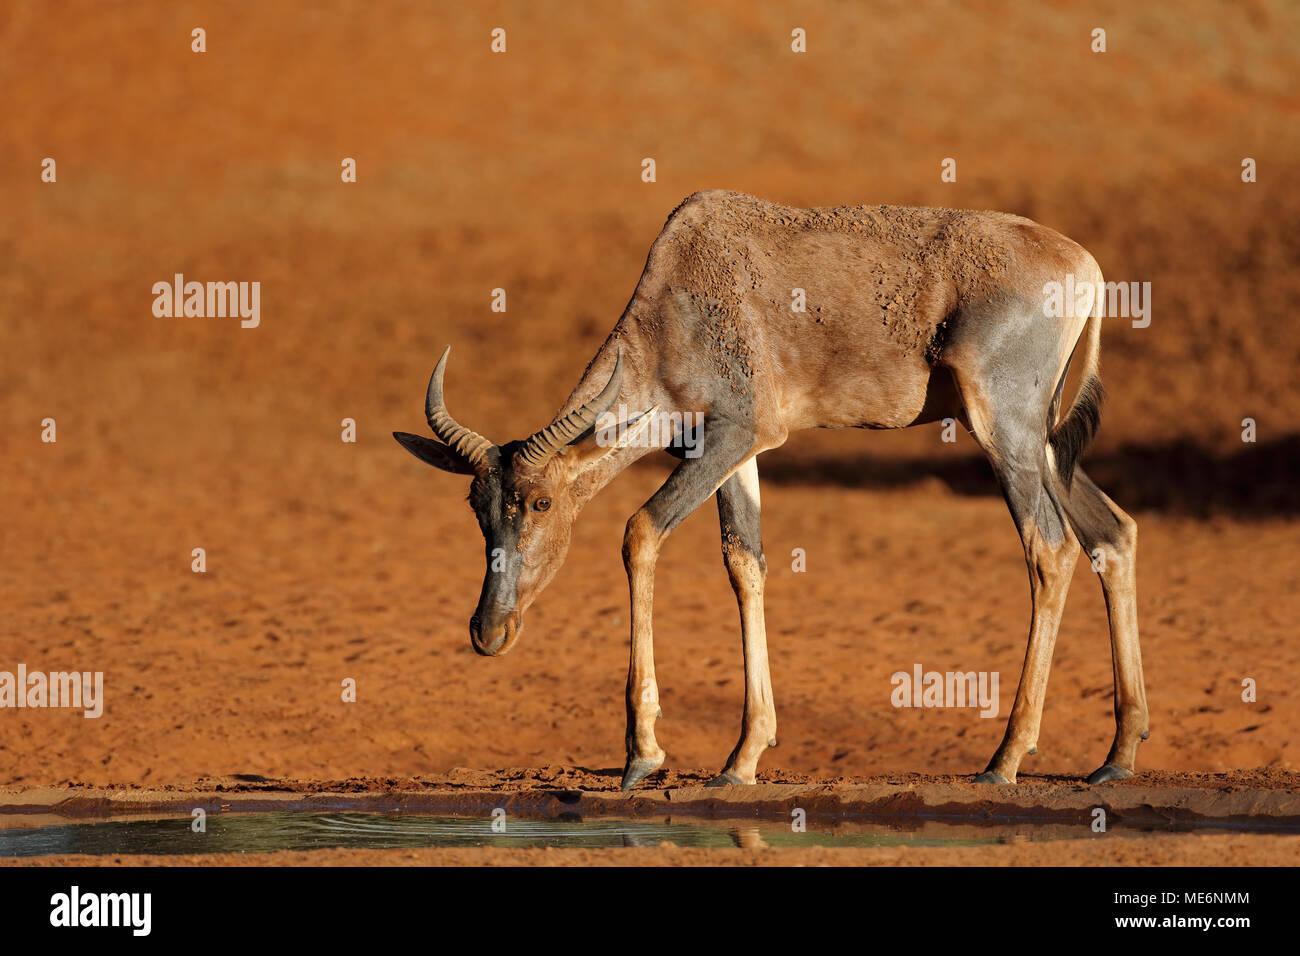 Rare tsessebe antelope (Damaliscus lunatus) at a waterhole, South Africa Stock Photo